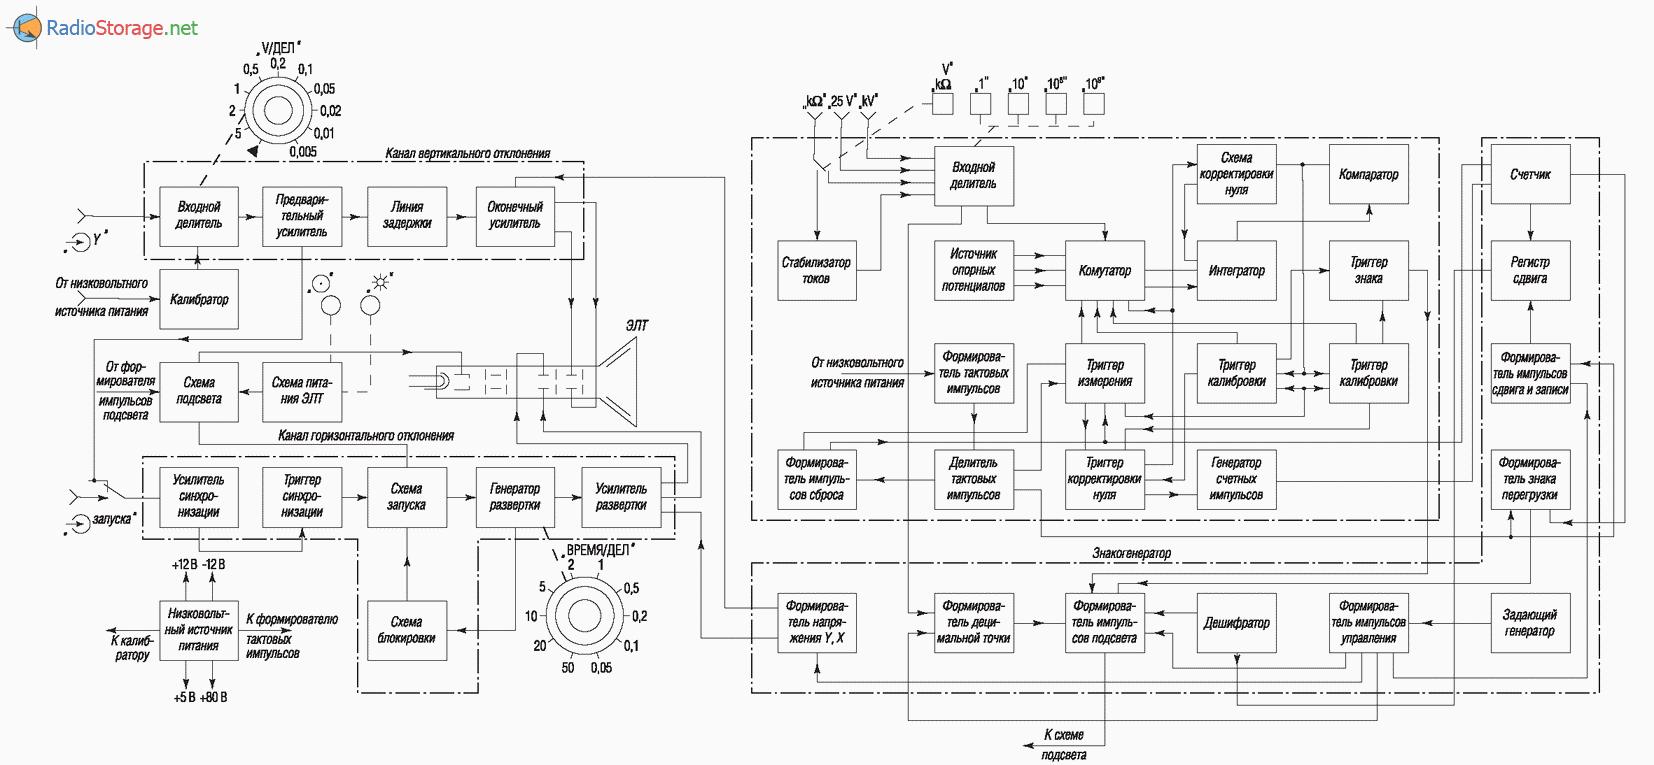 Схема осциллографа с1 112а фото 754